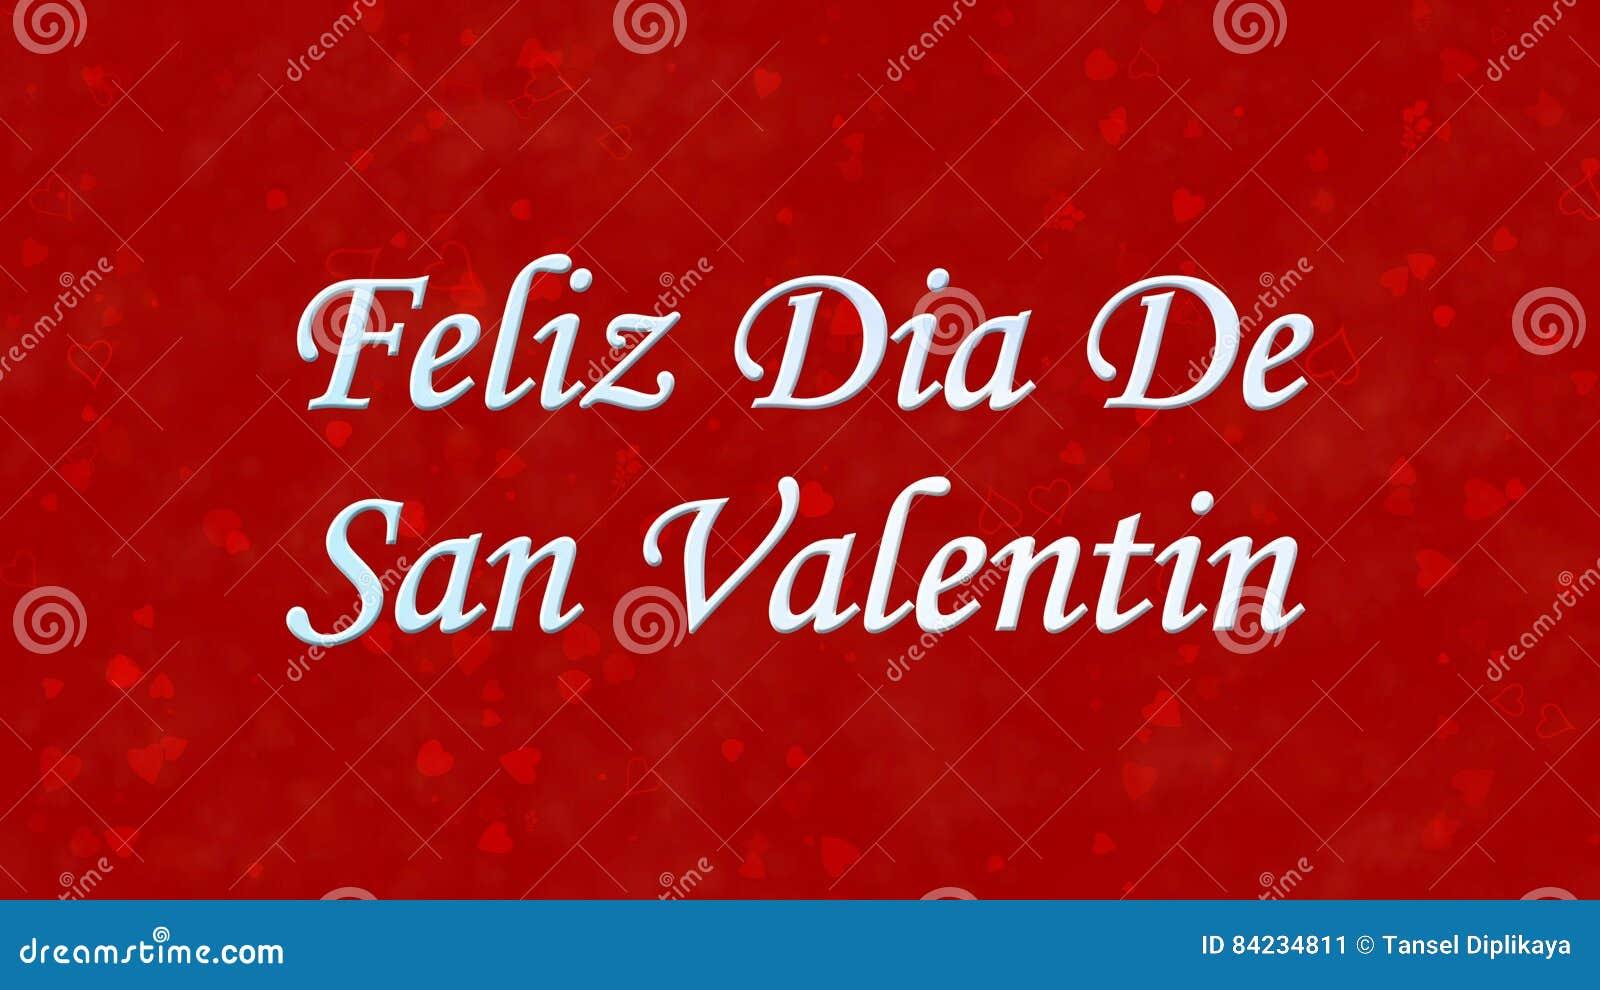 Happy Valentine S Day Text In Spanish Feliz Dia De San Valentin On Red  Background